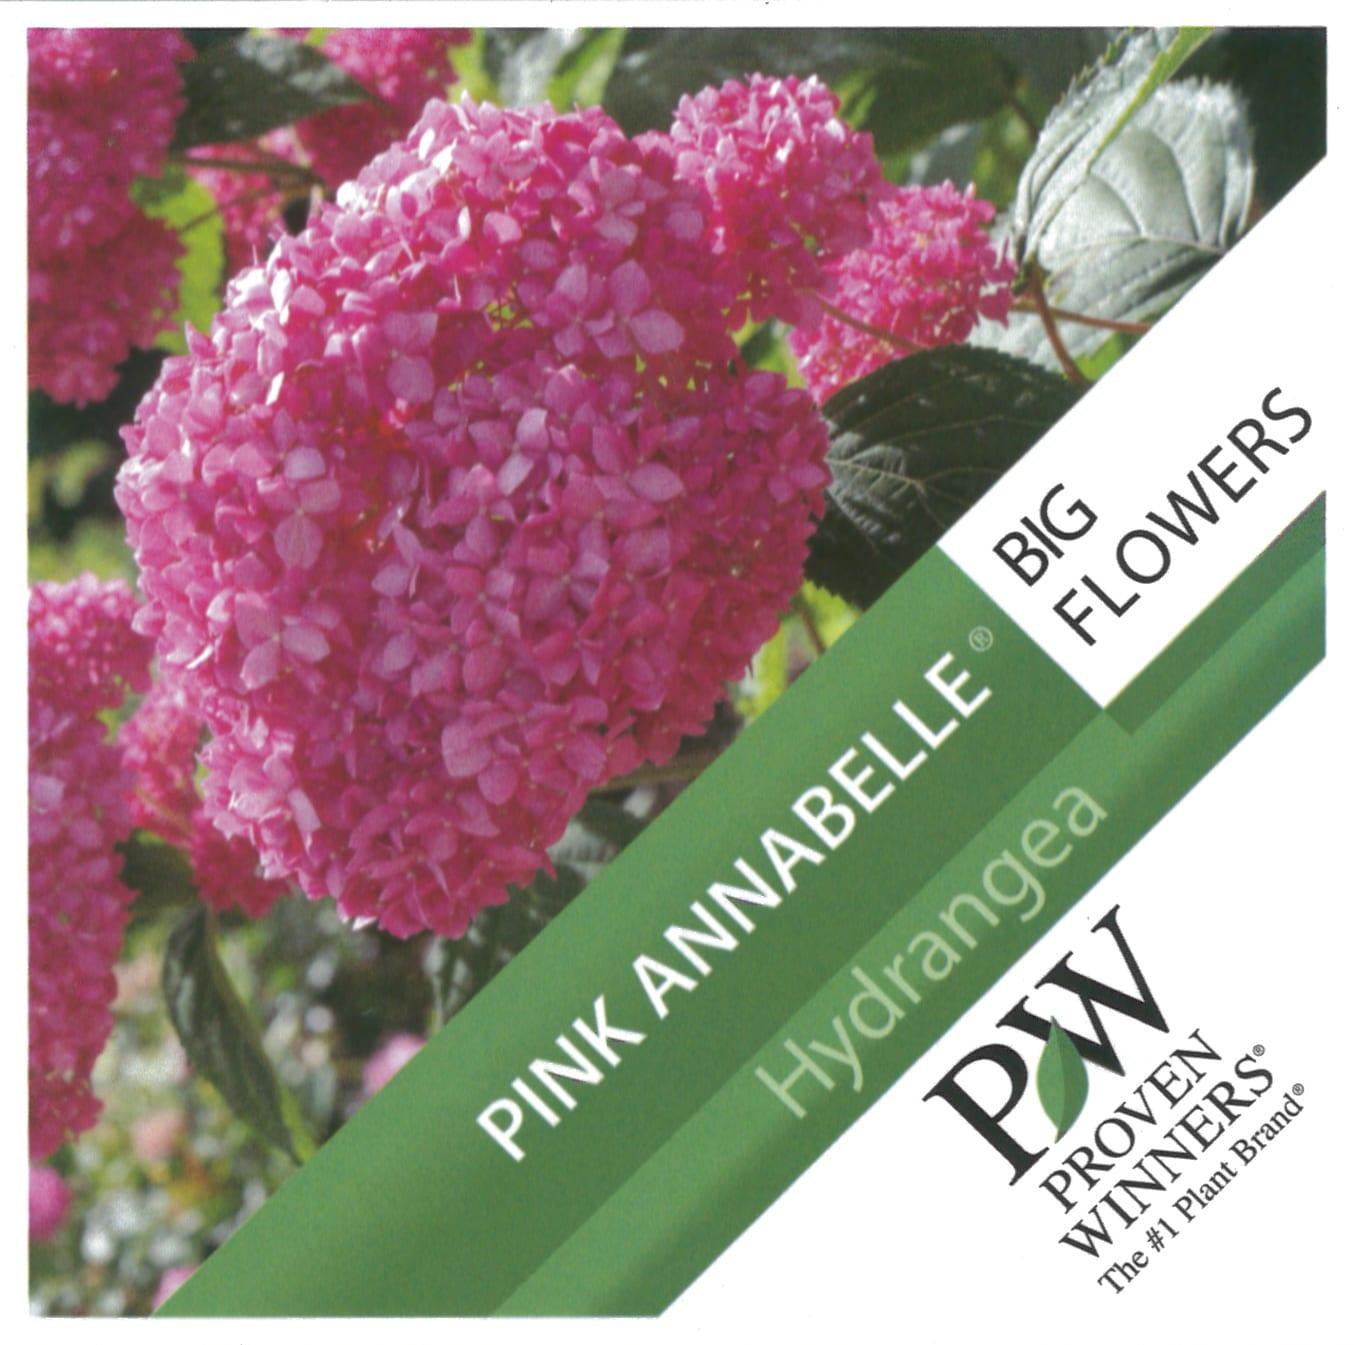 Hydrangea Proven Winners 'Pink Annabelle' etiket voorzijde | Plants By Nature - gespecialiseerd in hydrangea